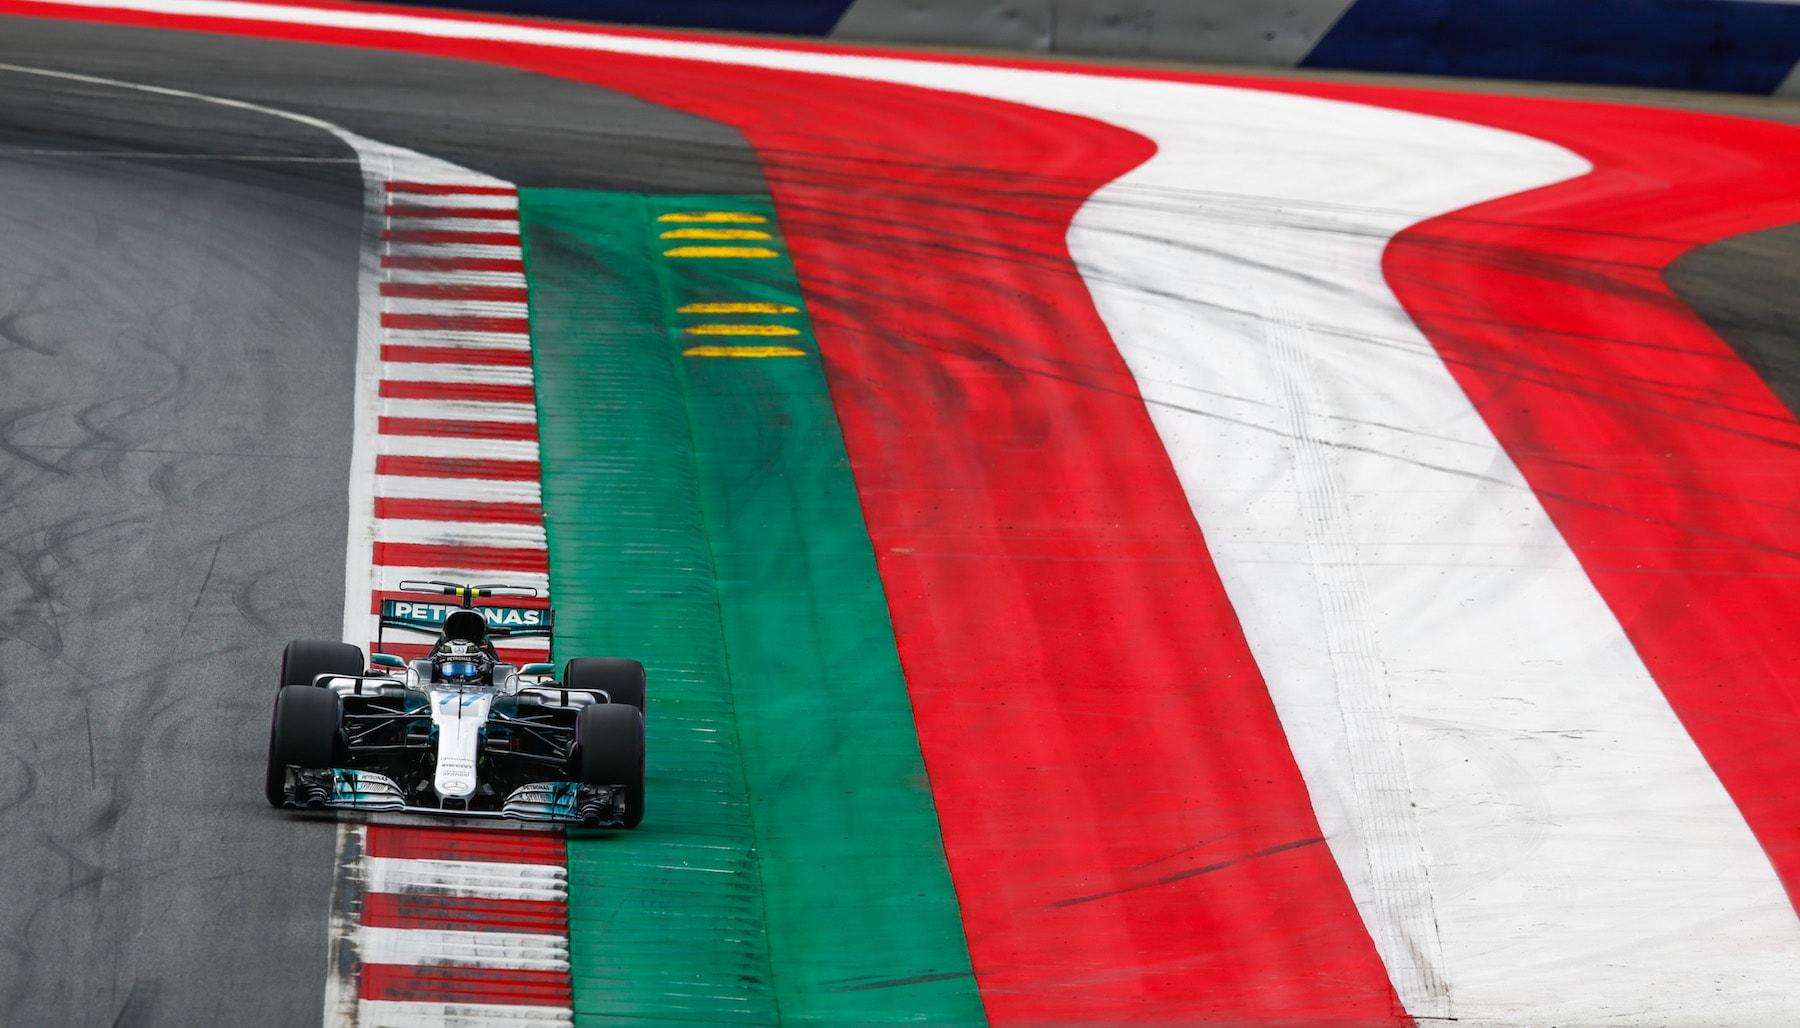 2017 Valtteri Bottas | Mercedes W08 | 2017 Austrian GP Q Pole 1photo by © Wolfgang Wilhelm for Daimler AG copy.jpg